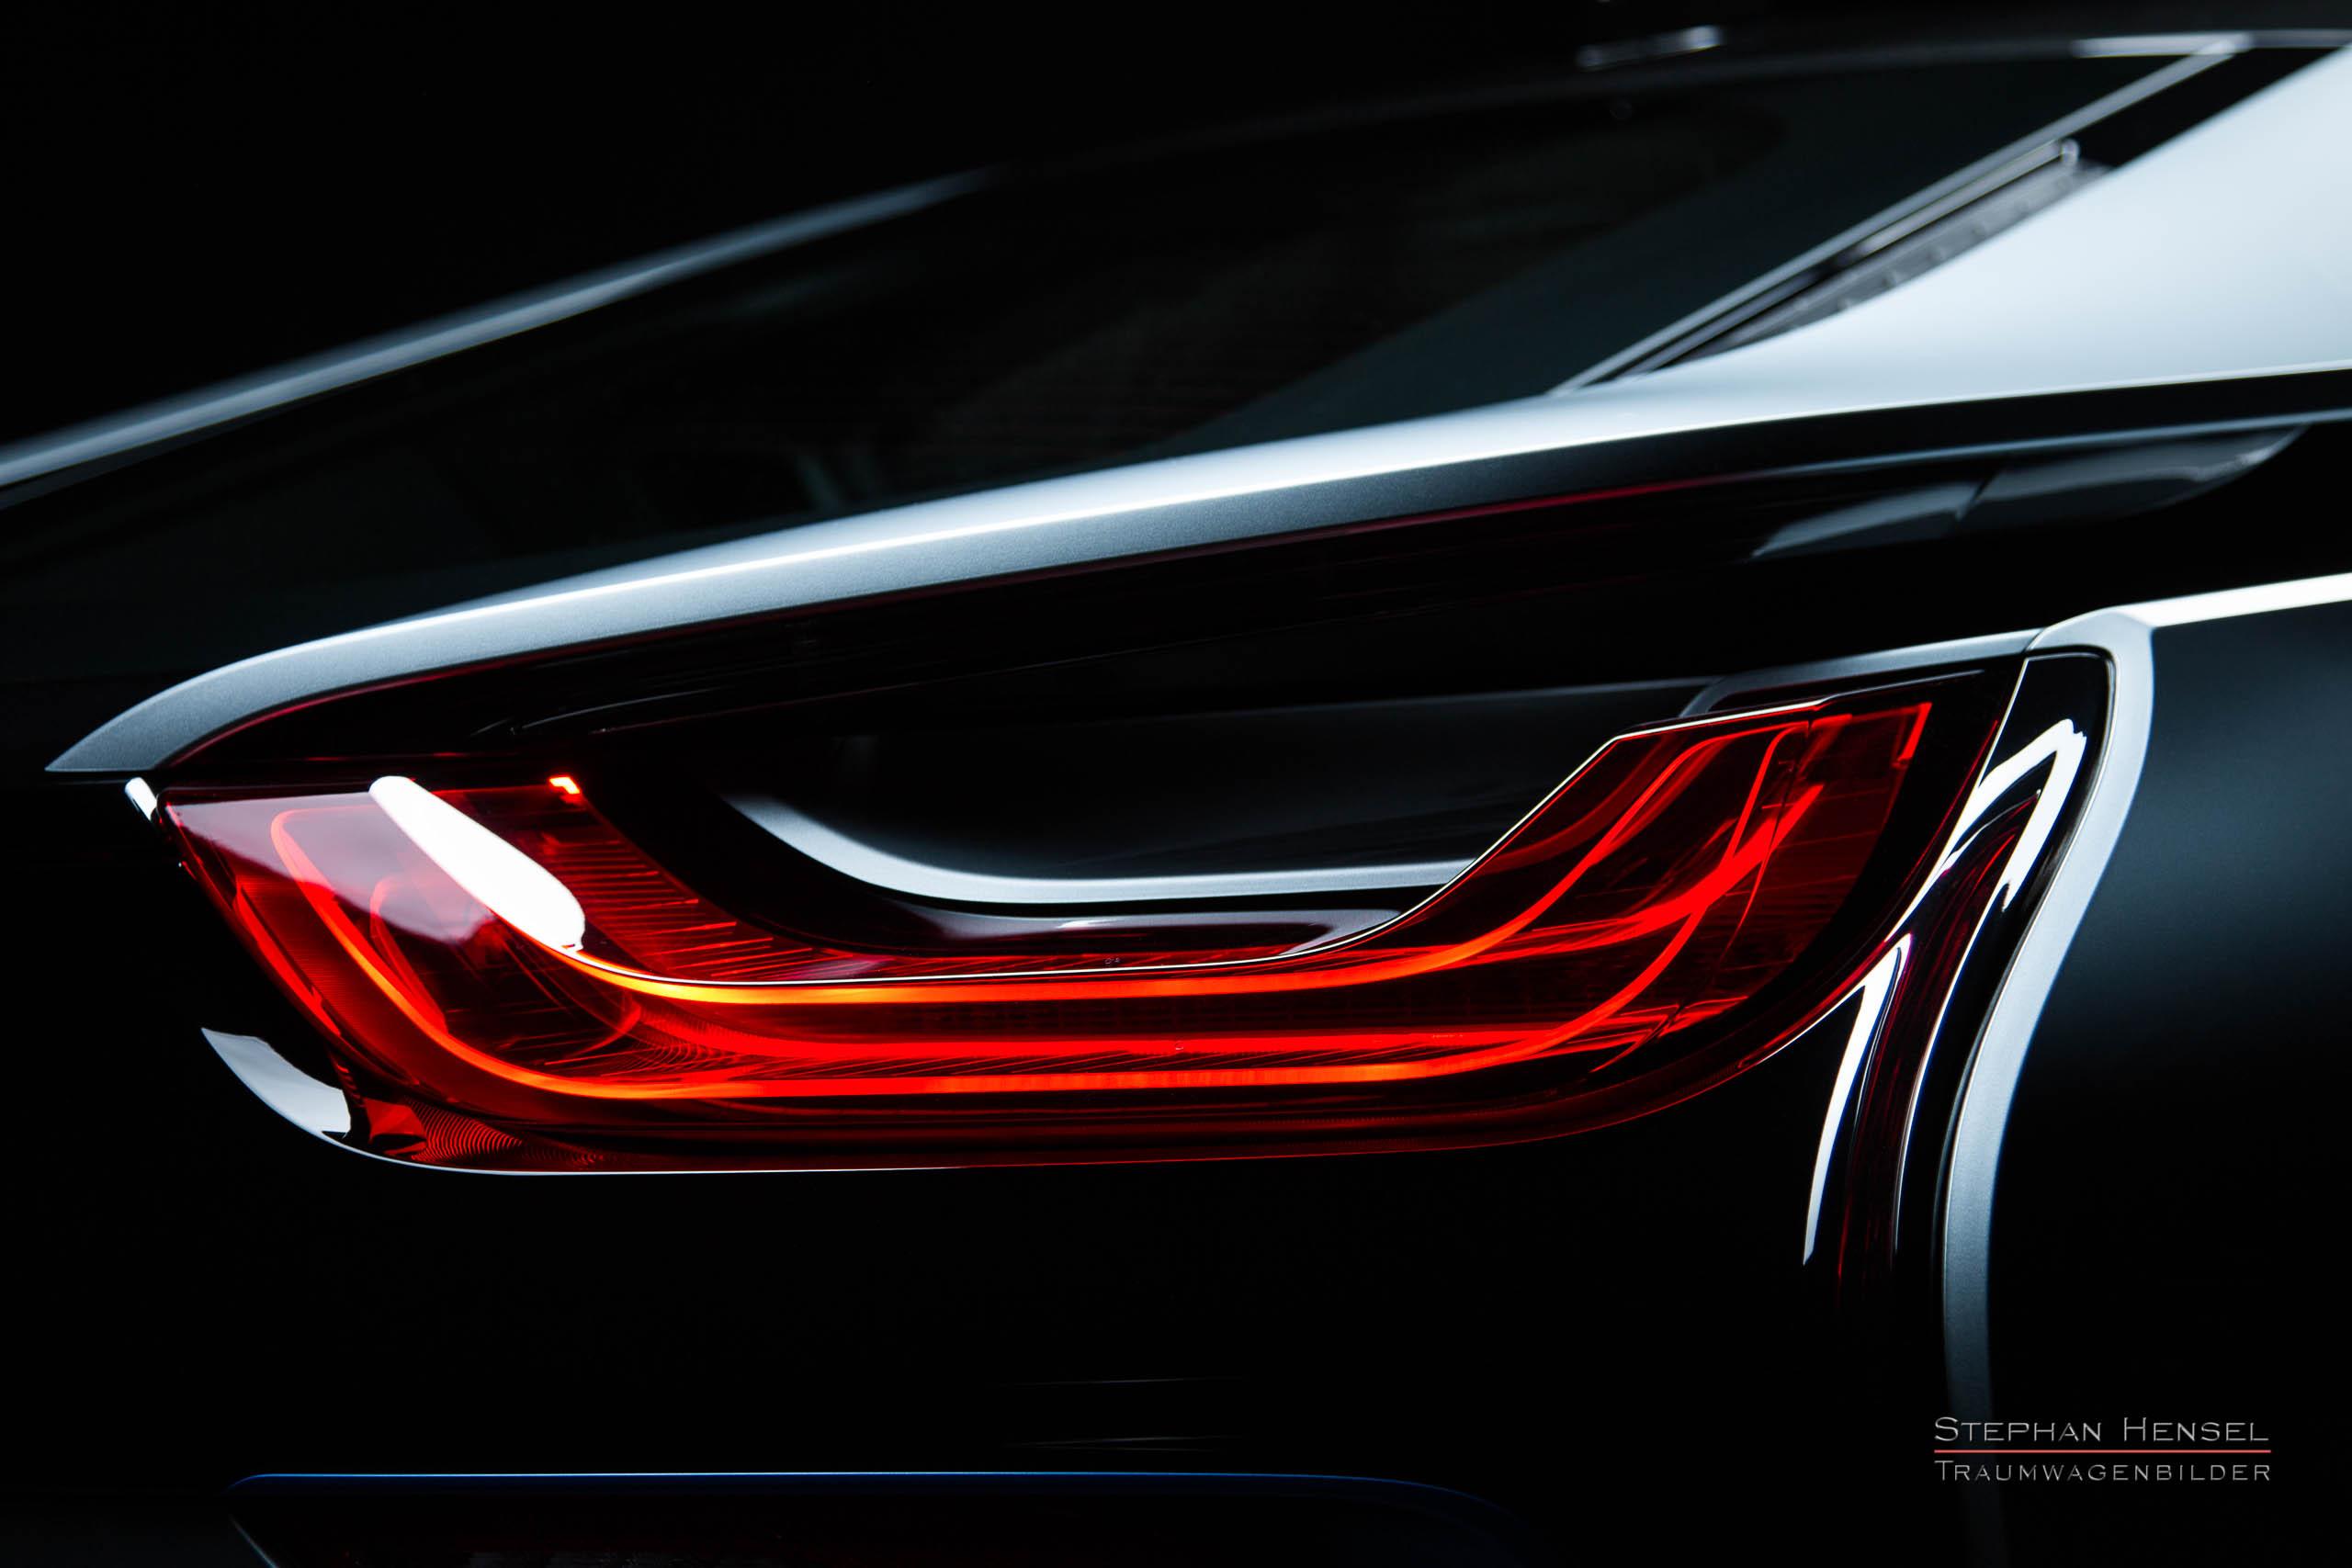 BMW i8, Detailansicht Kotlfügel hinten rechts, Autofotograf: Stephan Hensel, Oldtimerfotograf, Hamburg